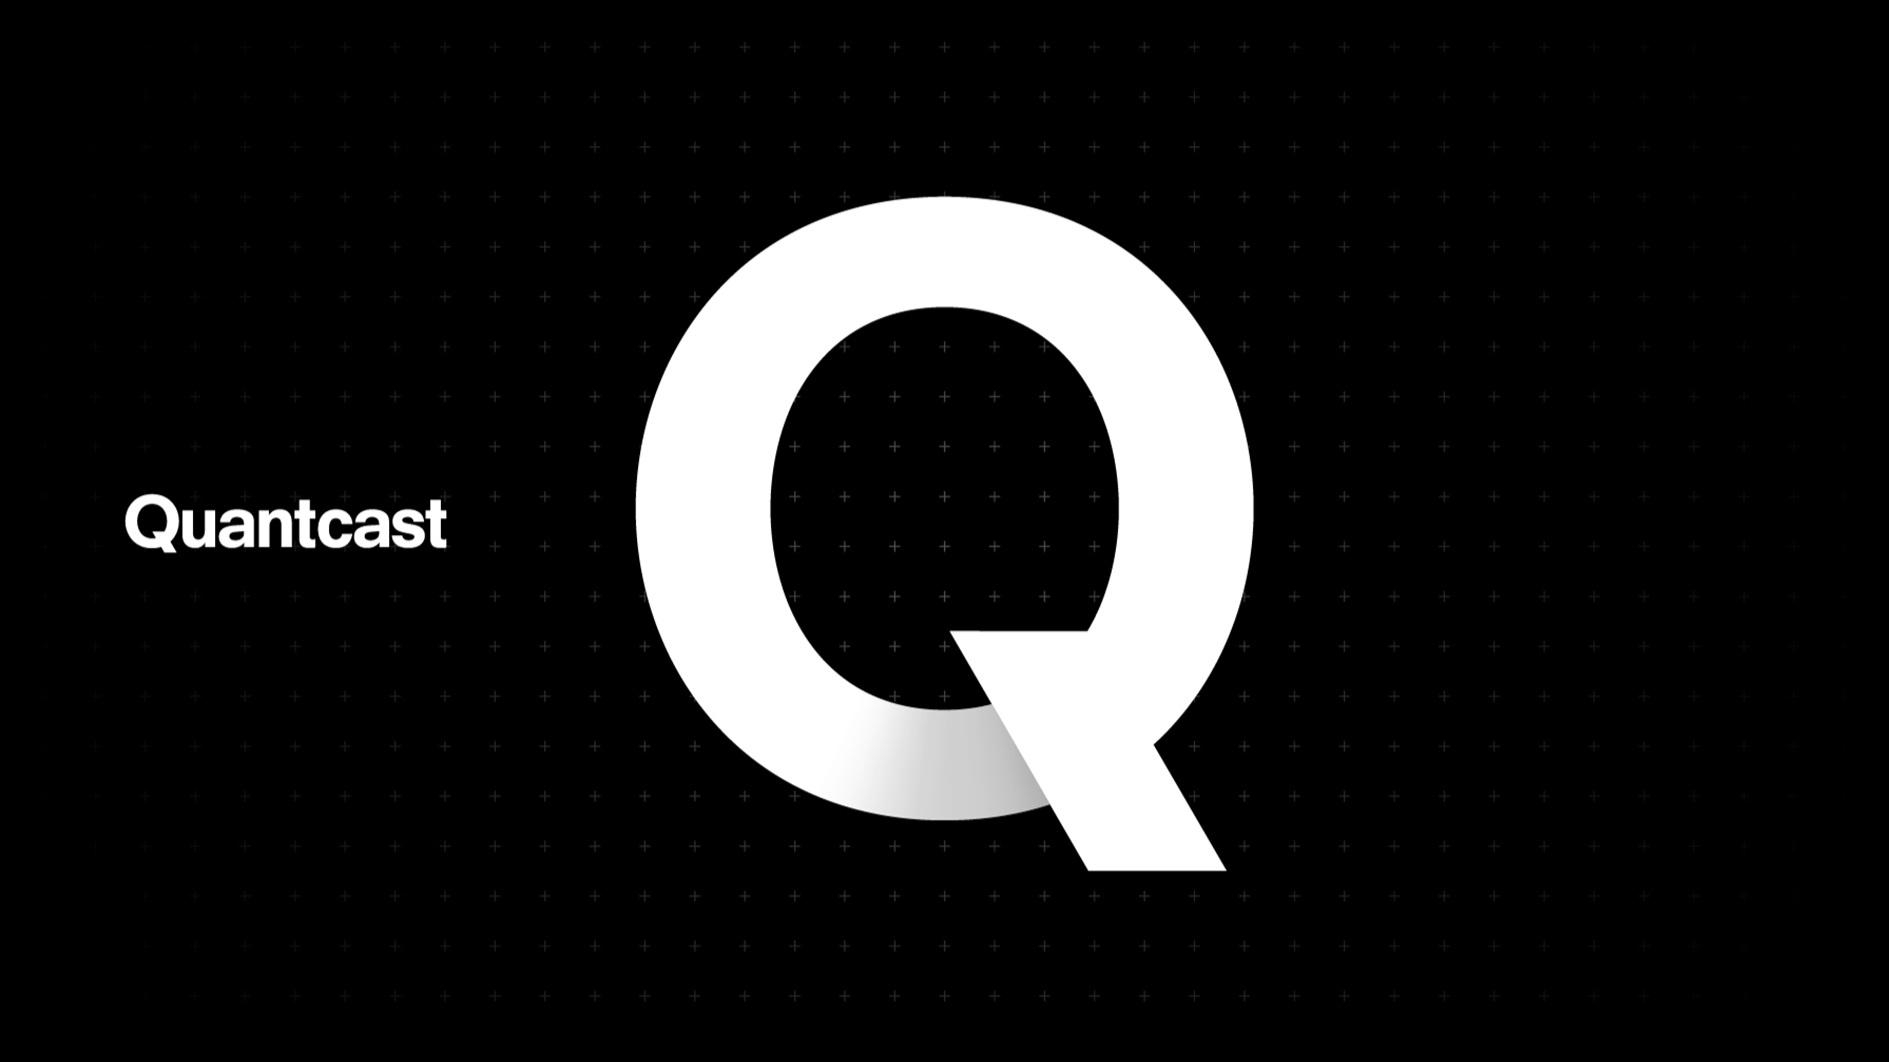 Quantcast - Brand Identity